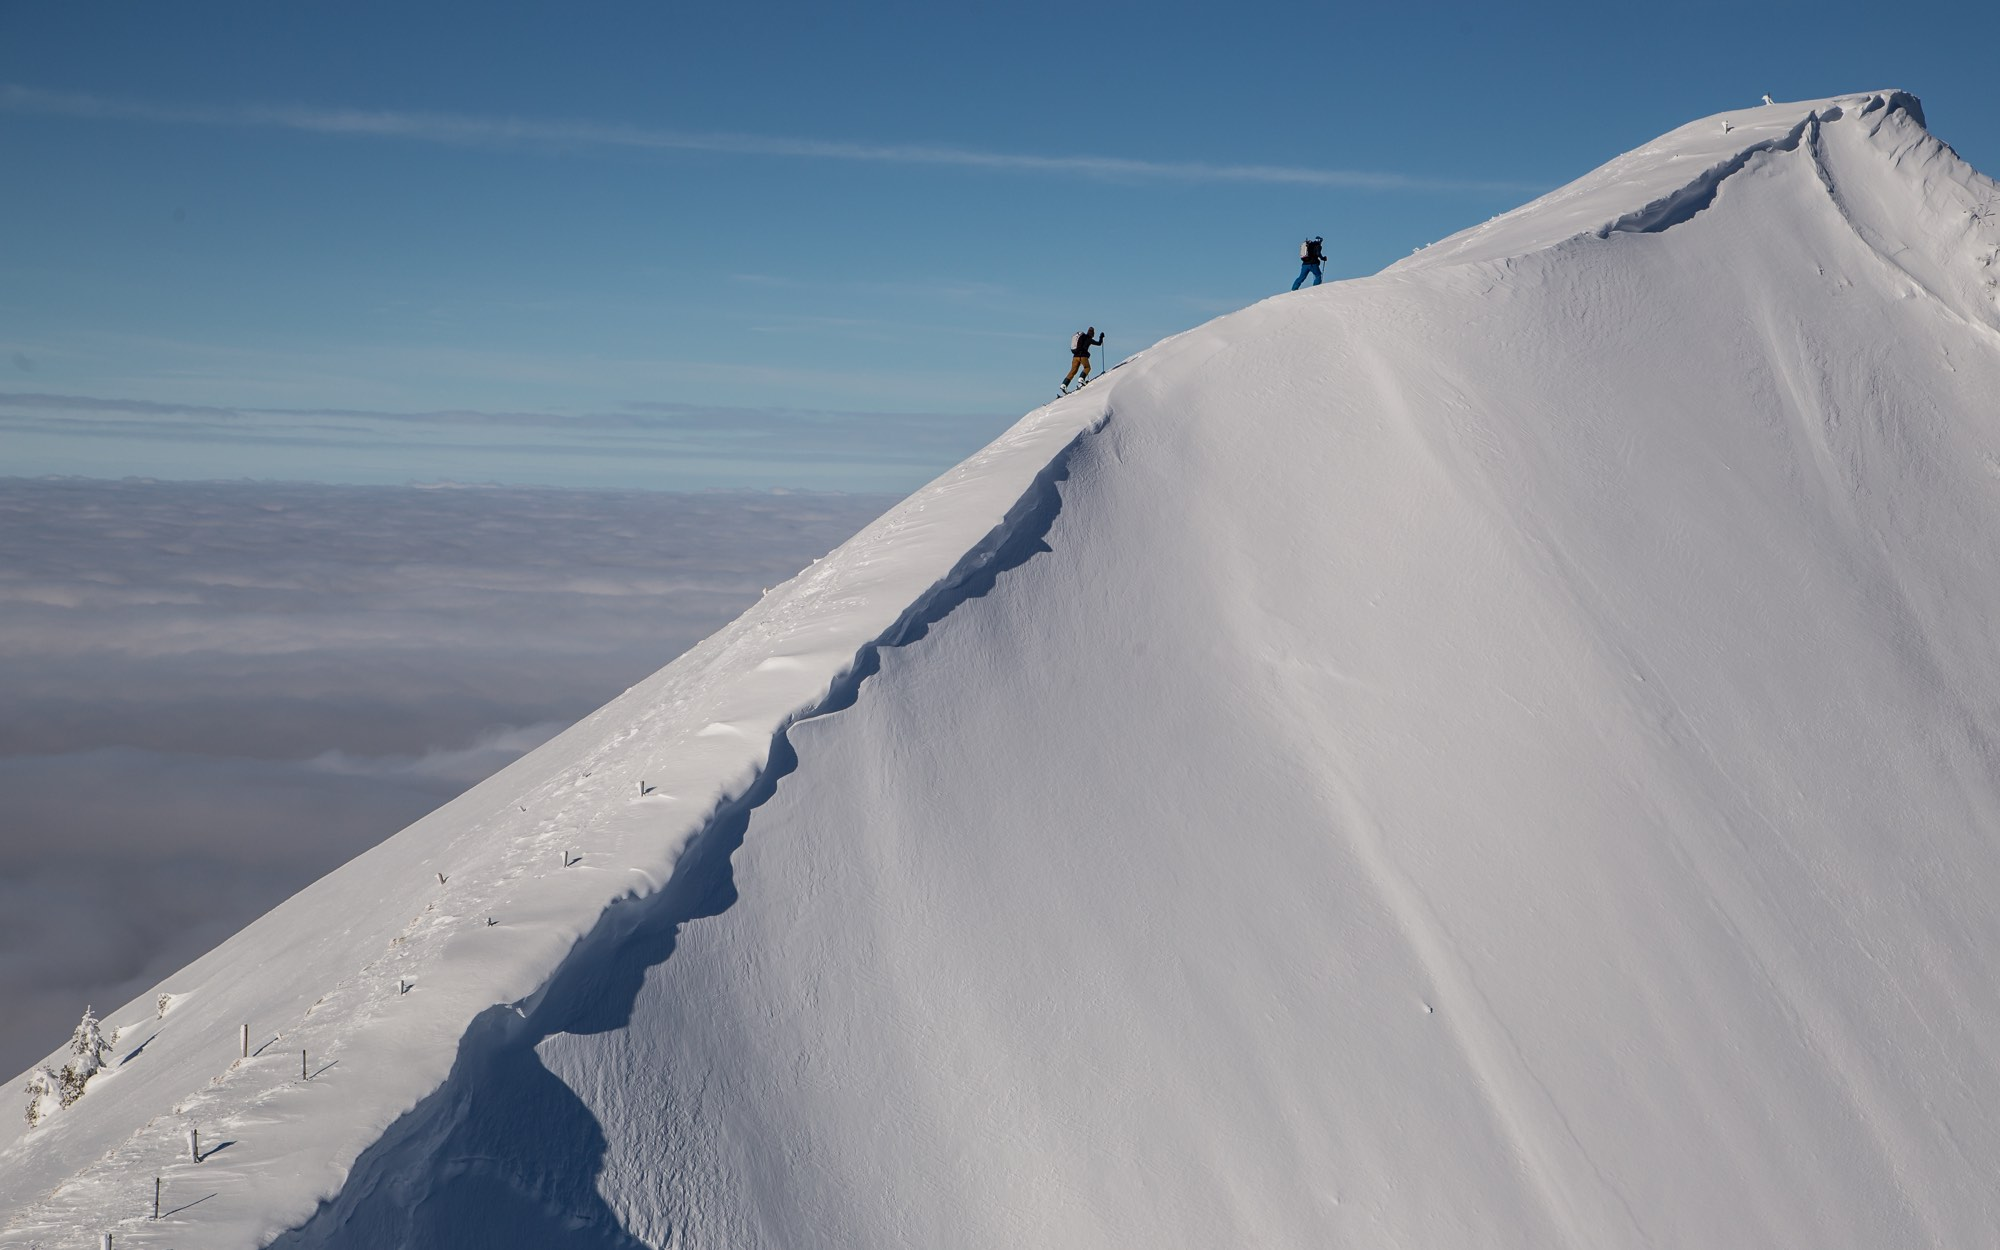 climbing to the top, on the ridge